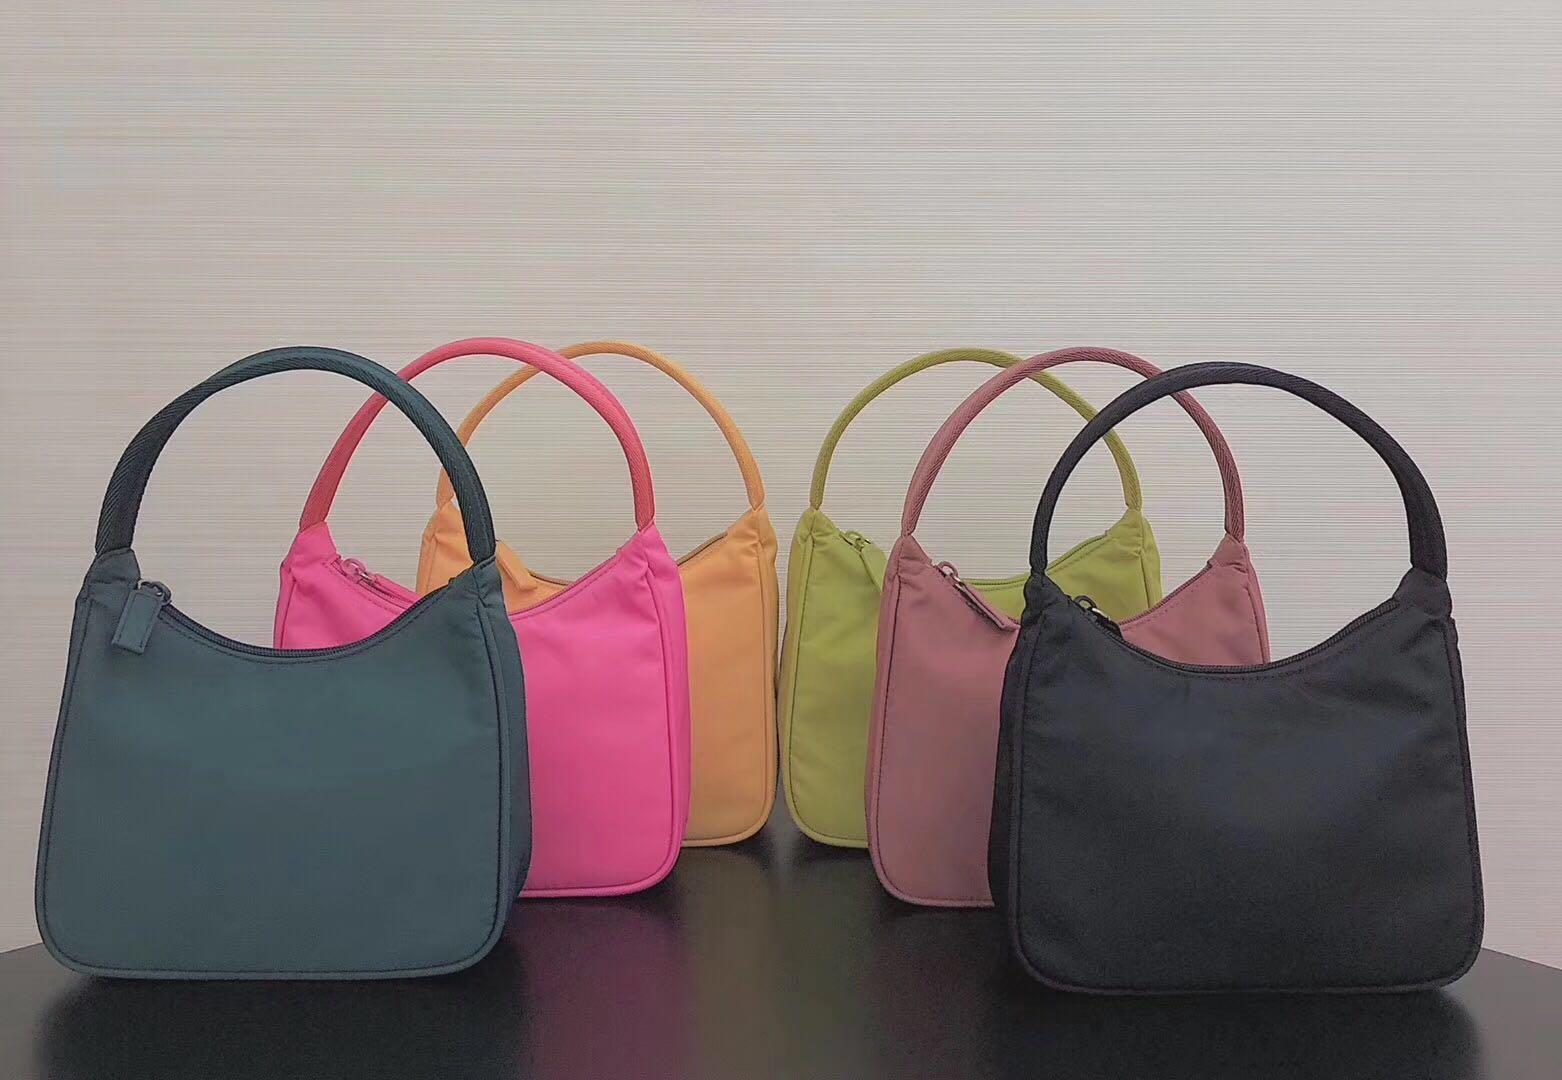 Wholesale waterproof canvas female tramp shoulder bag female fashion shoulder large capacity handbag armpit bag lady crossbody bag